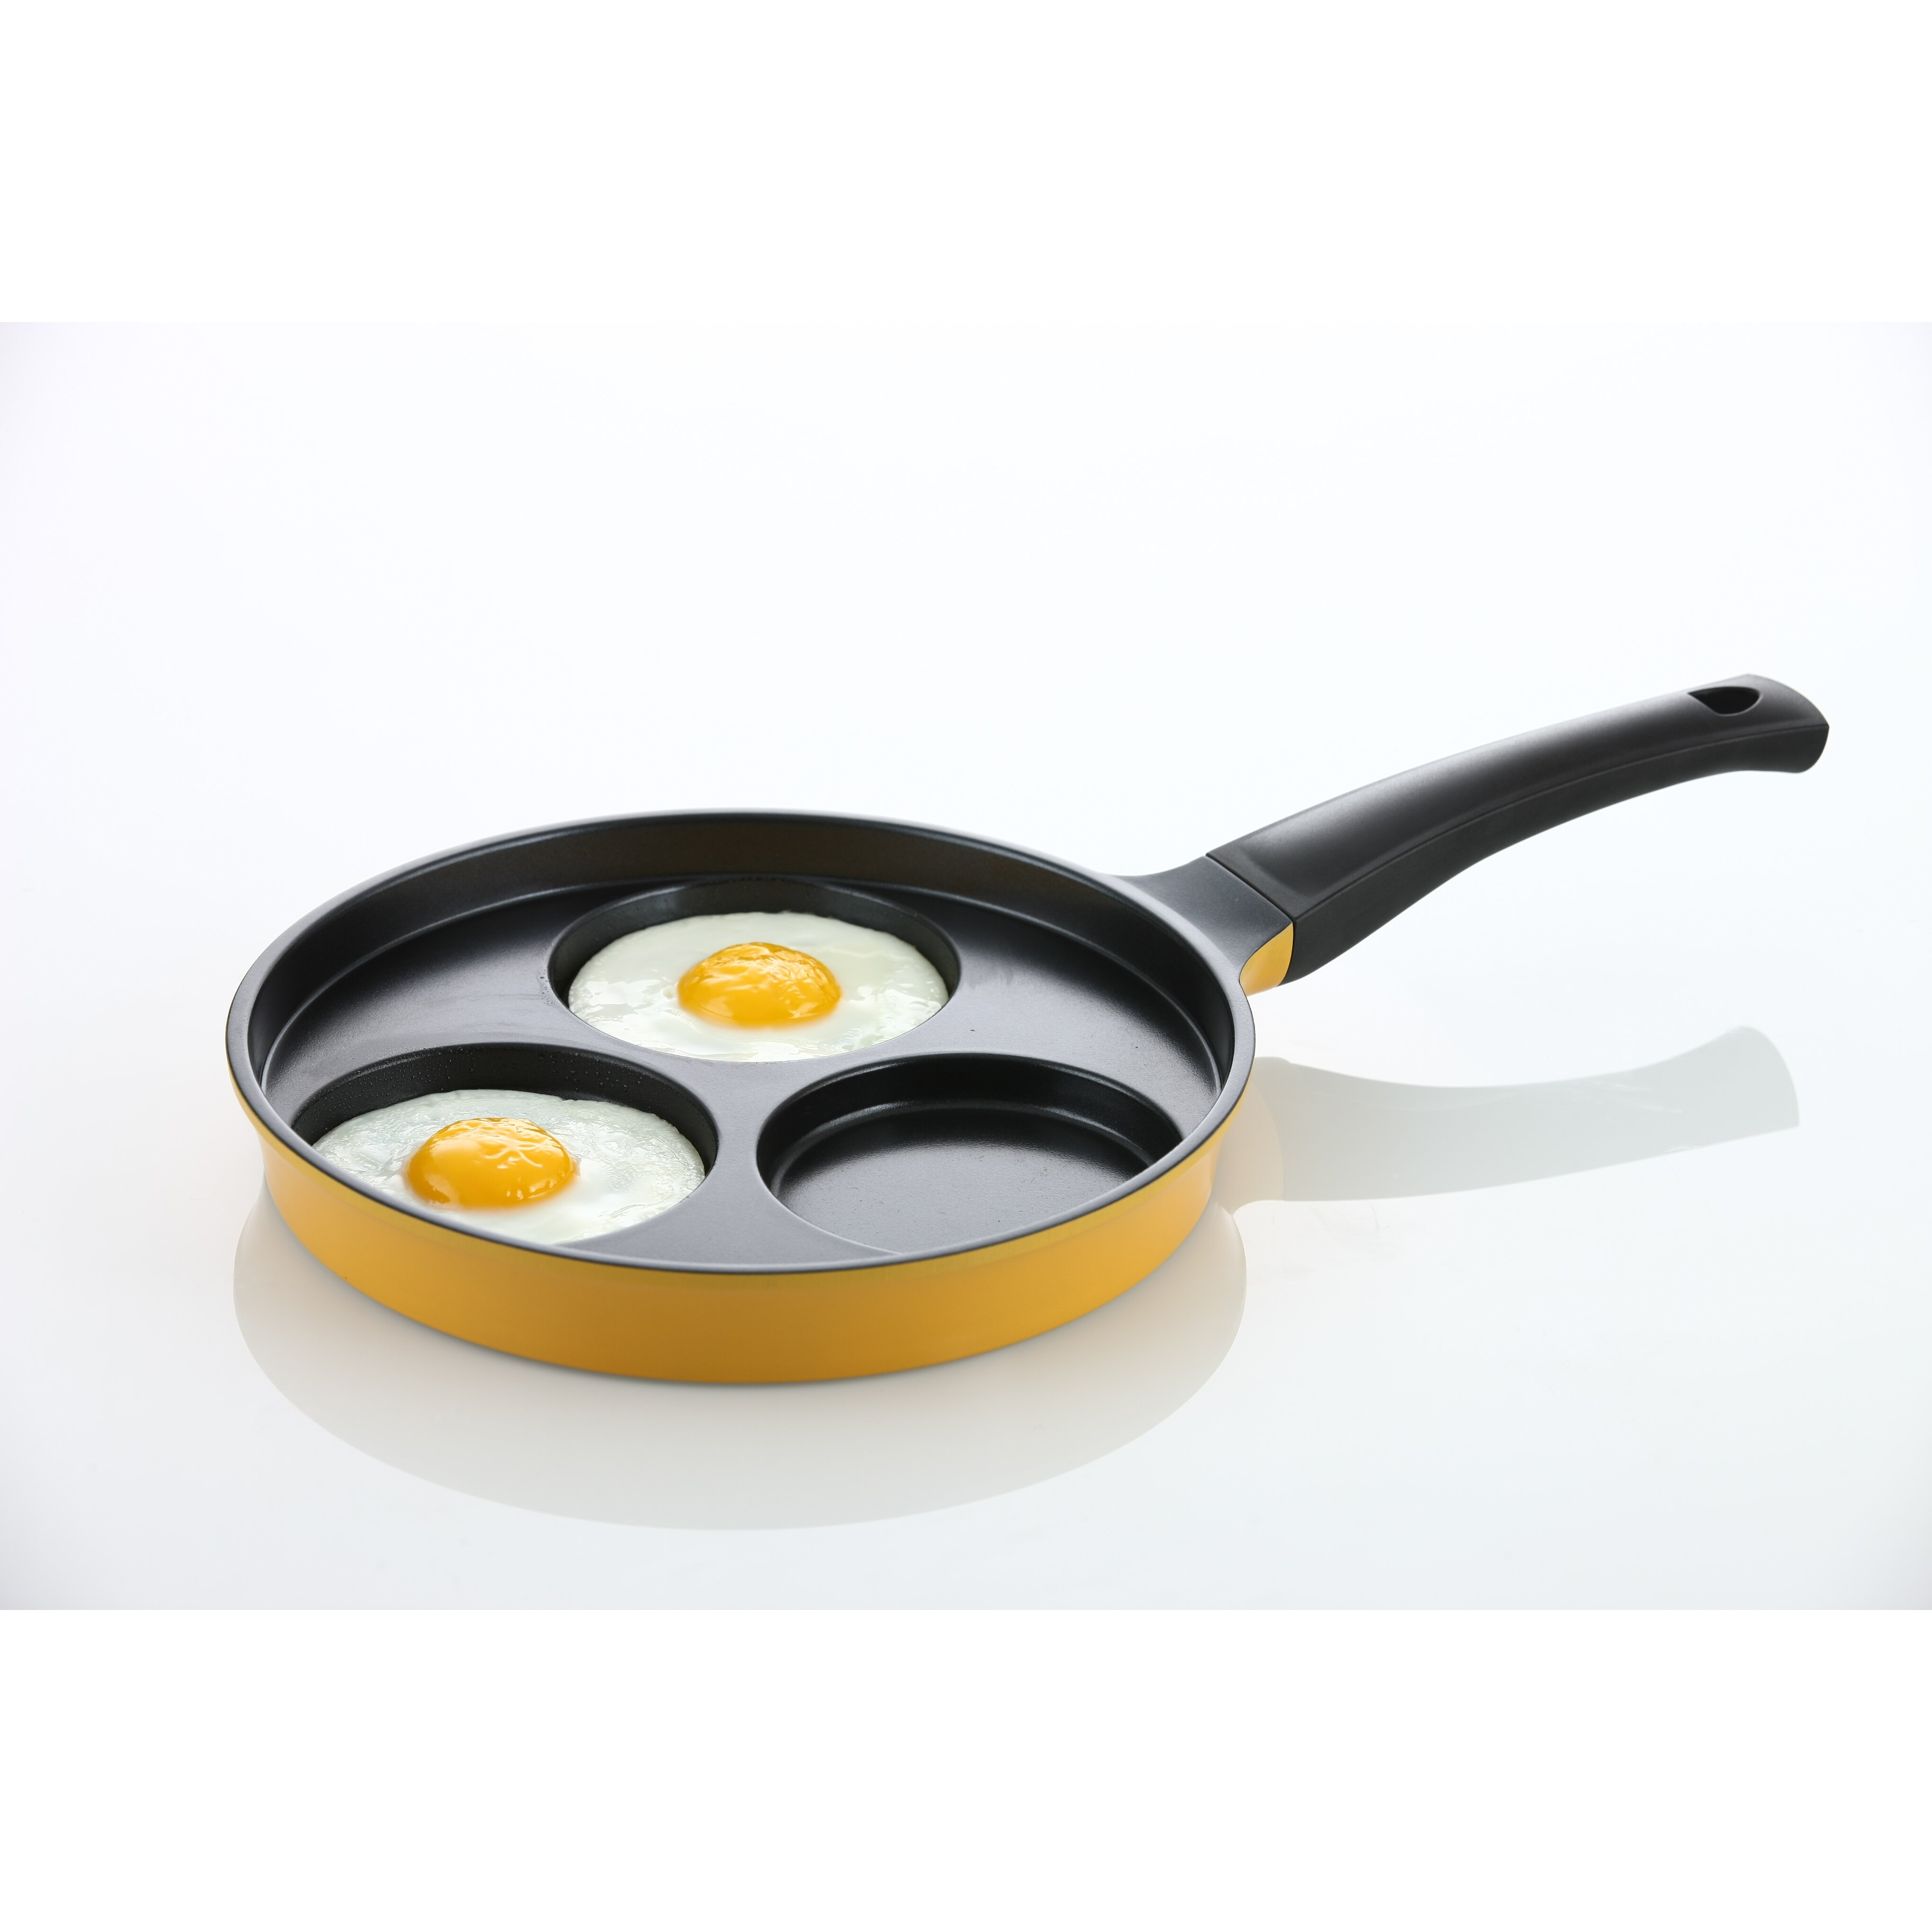 Flamekiss Non Stick Egg Pan Amp Reviews Wayfair